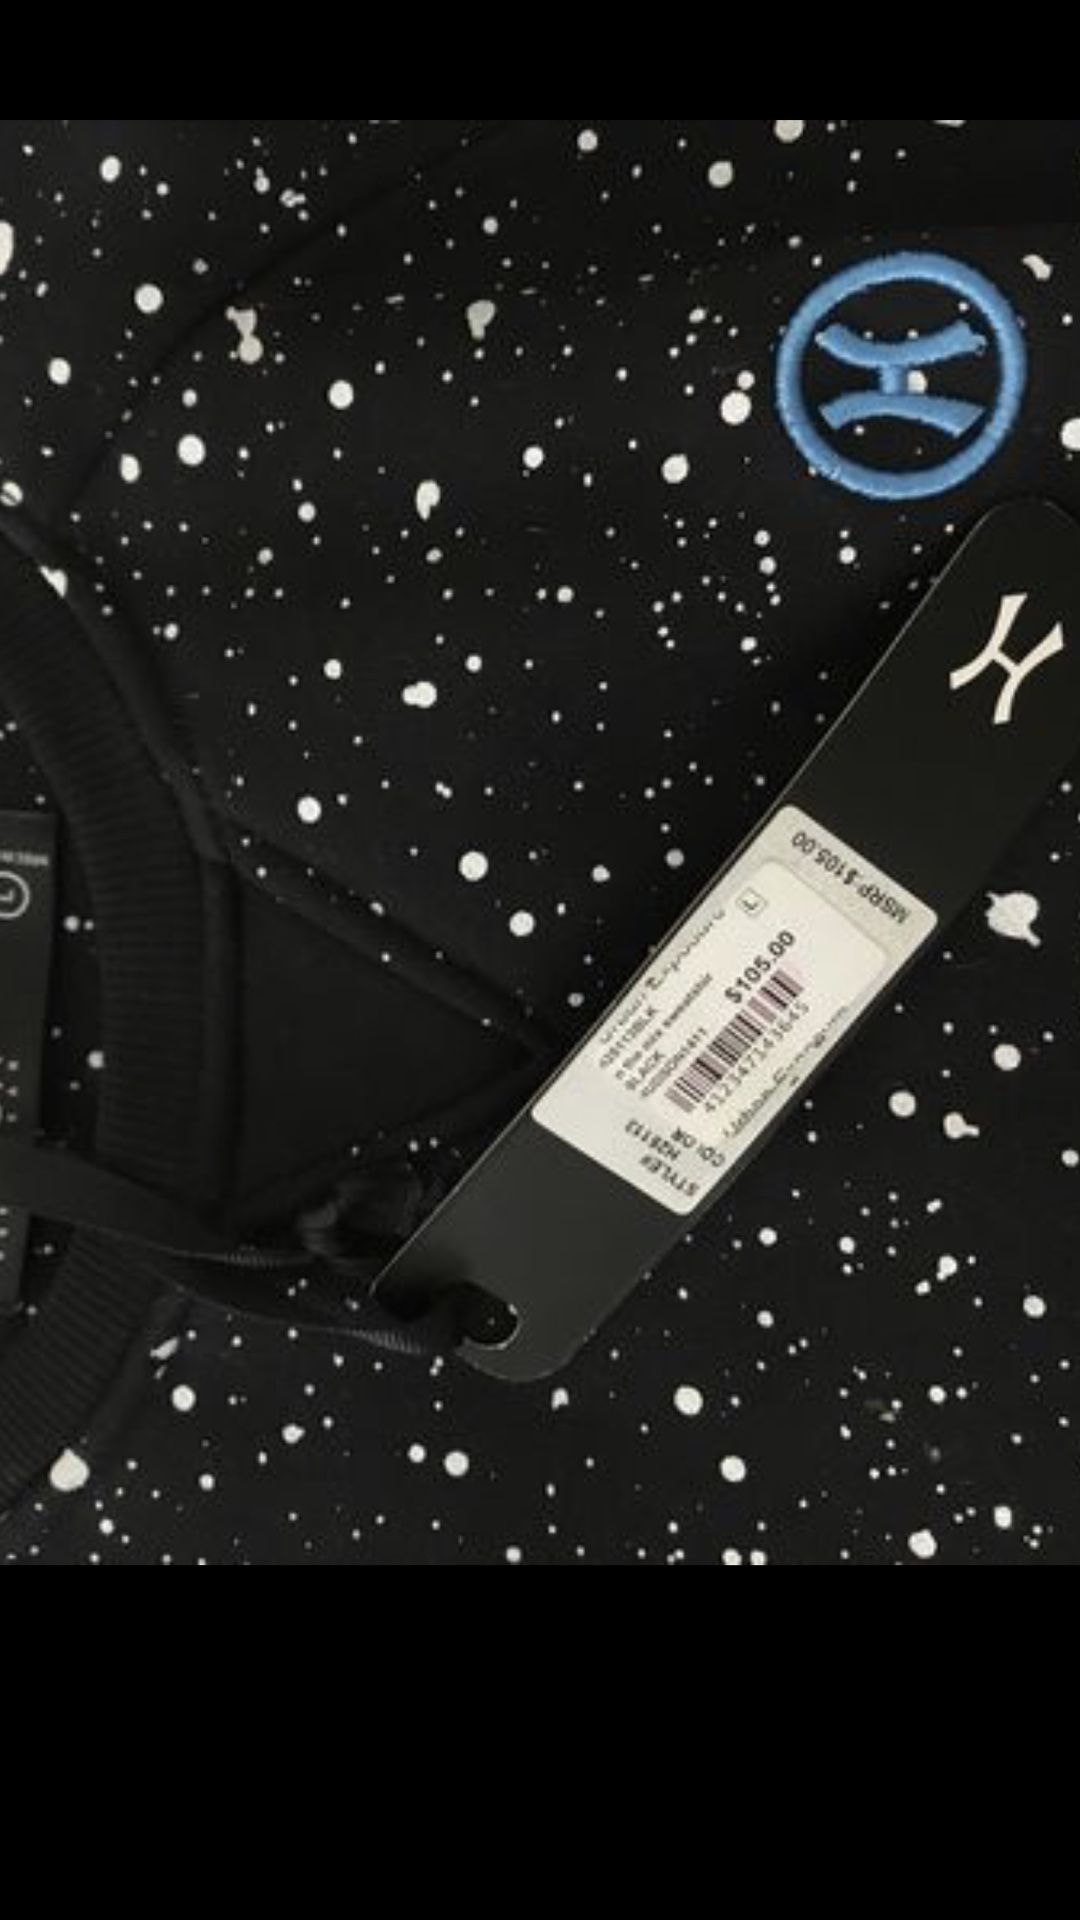 Burberry/Hudson/ Calvin Klein